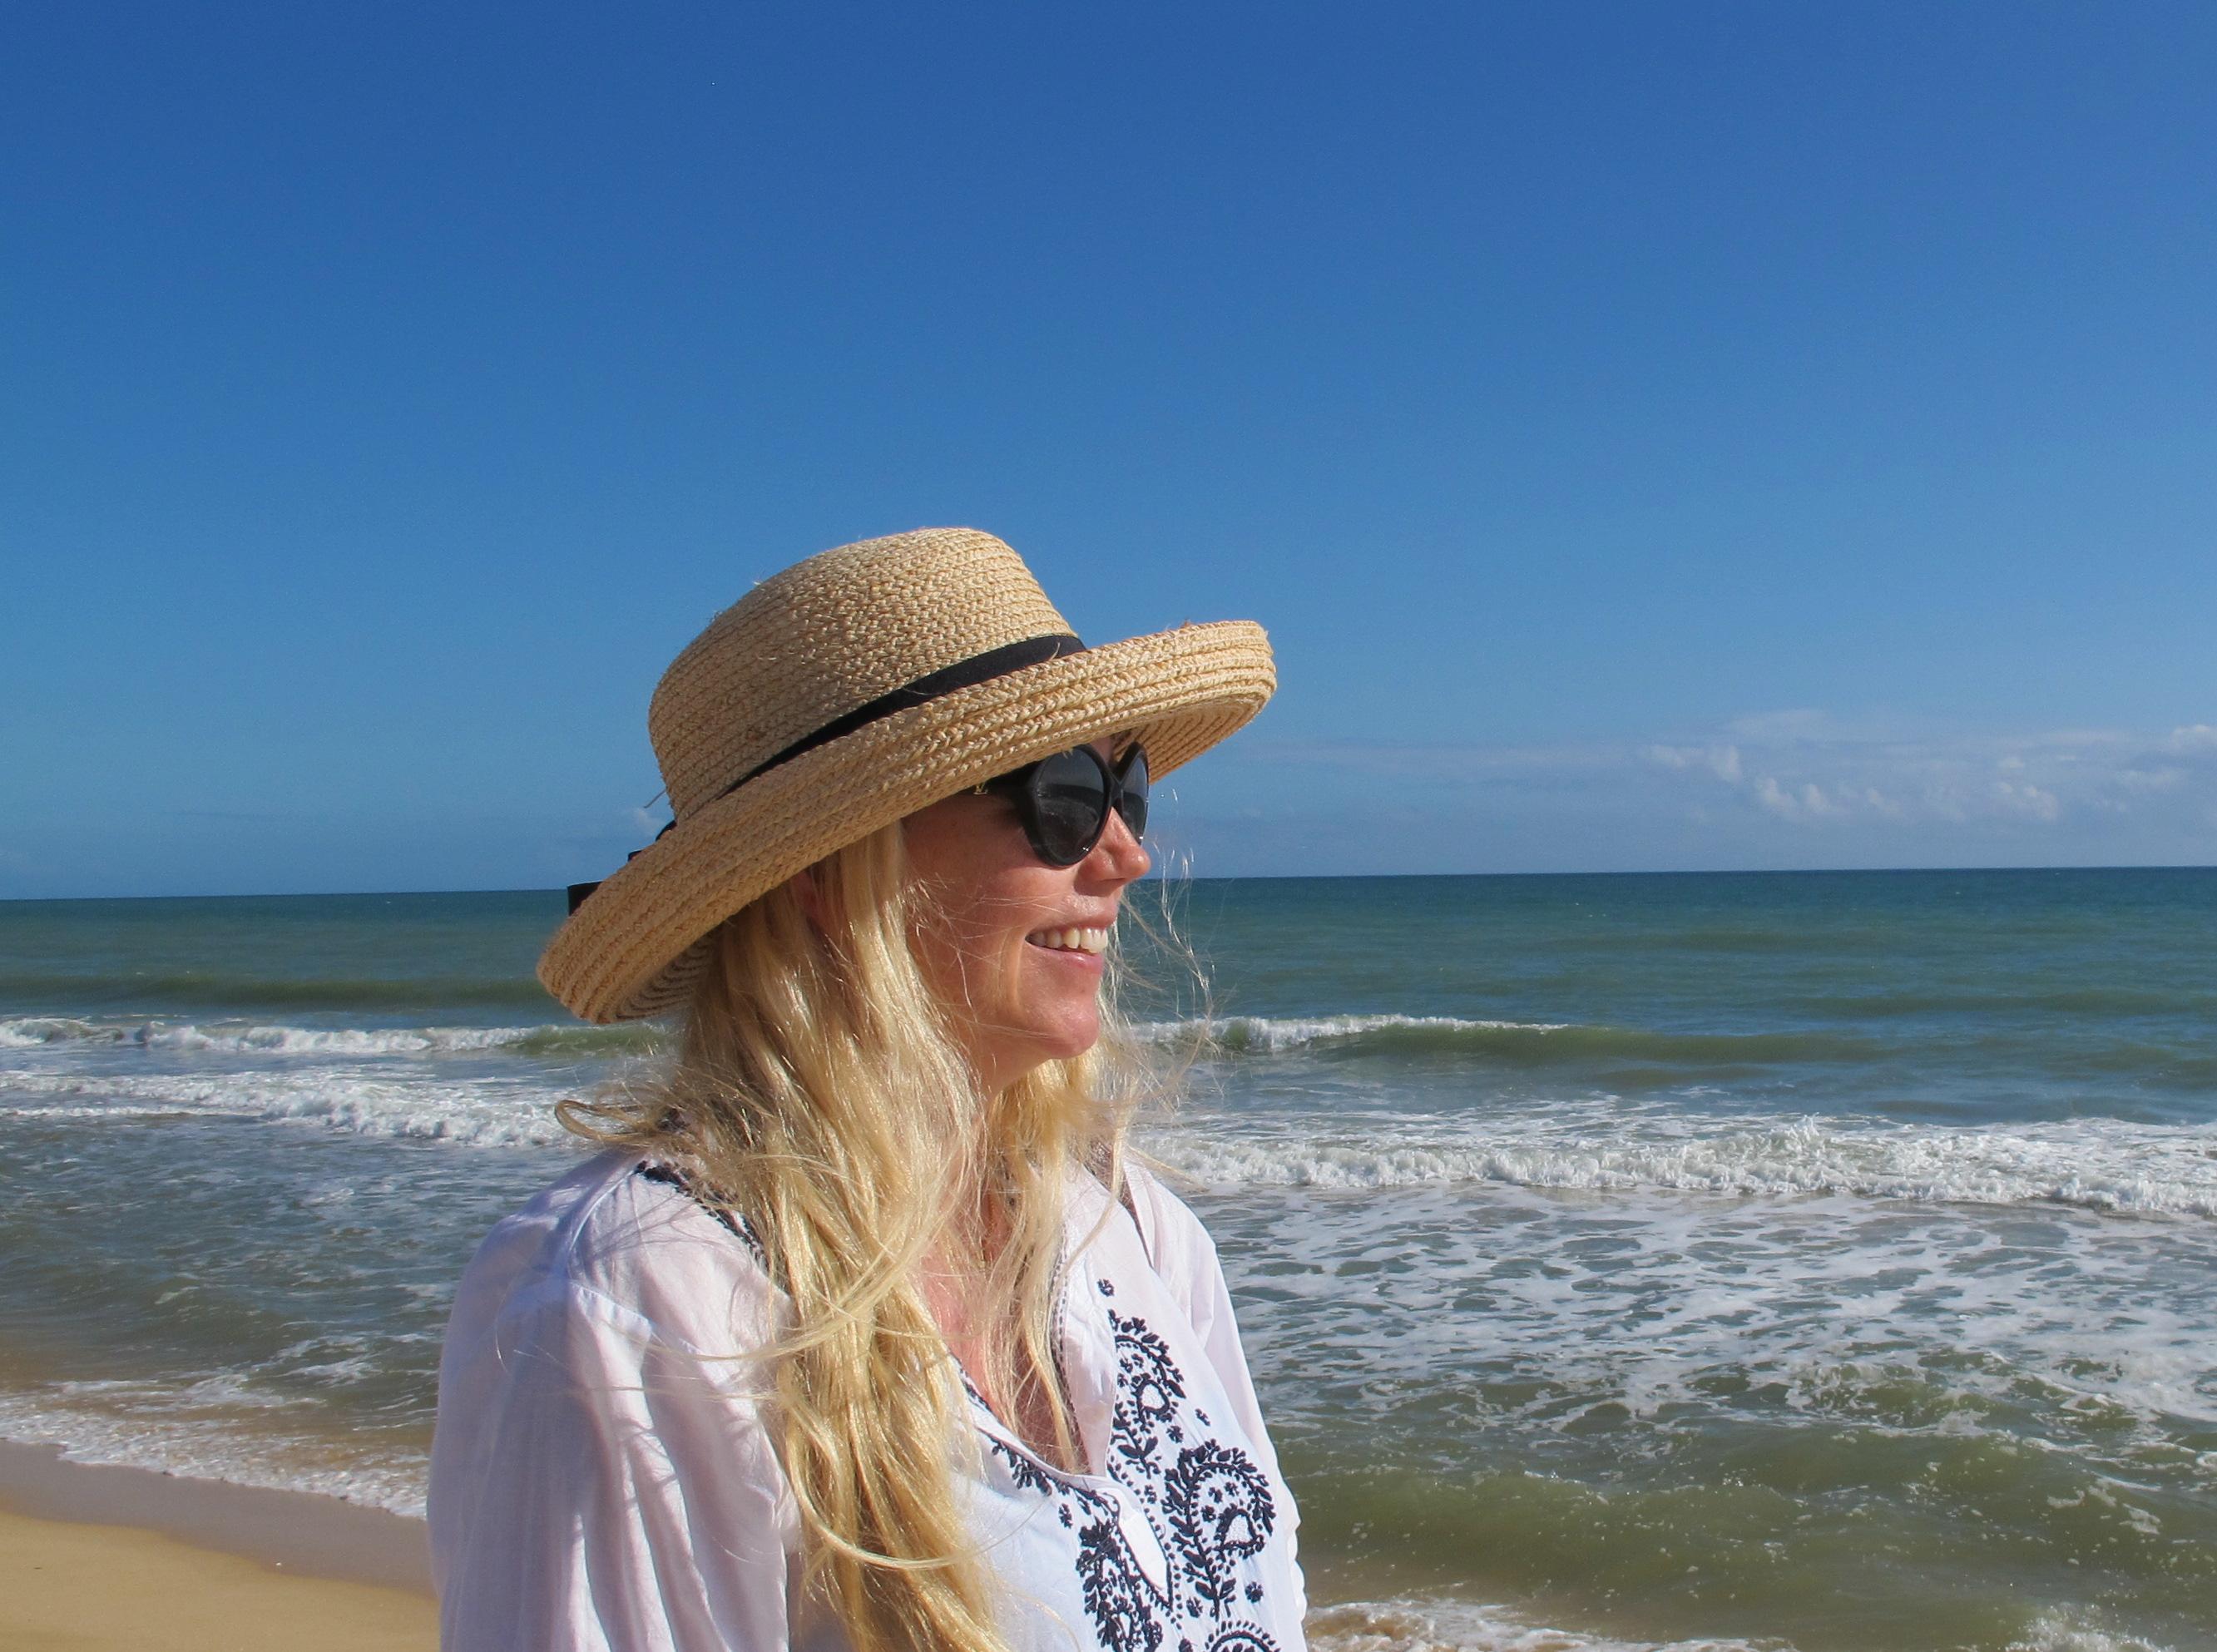 Strand, Küste, Töpfern, Keramik, Portugal, Algarve, Handwerk. Handwerkskunst, Reisefeder, blog, travelblog, Reiseblog